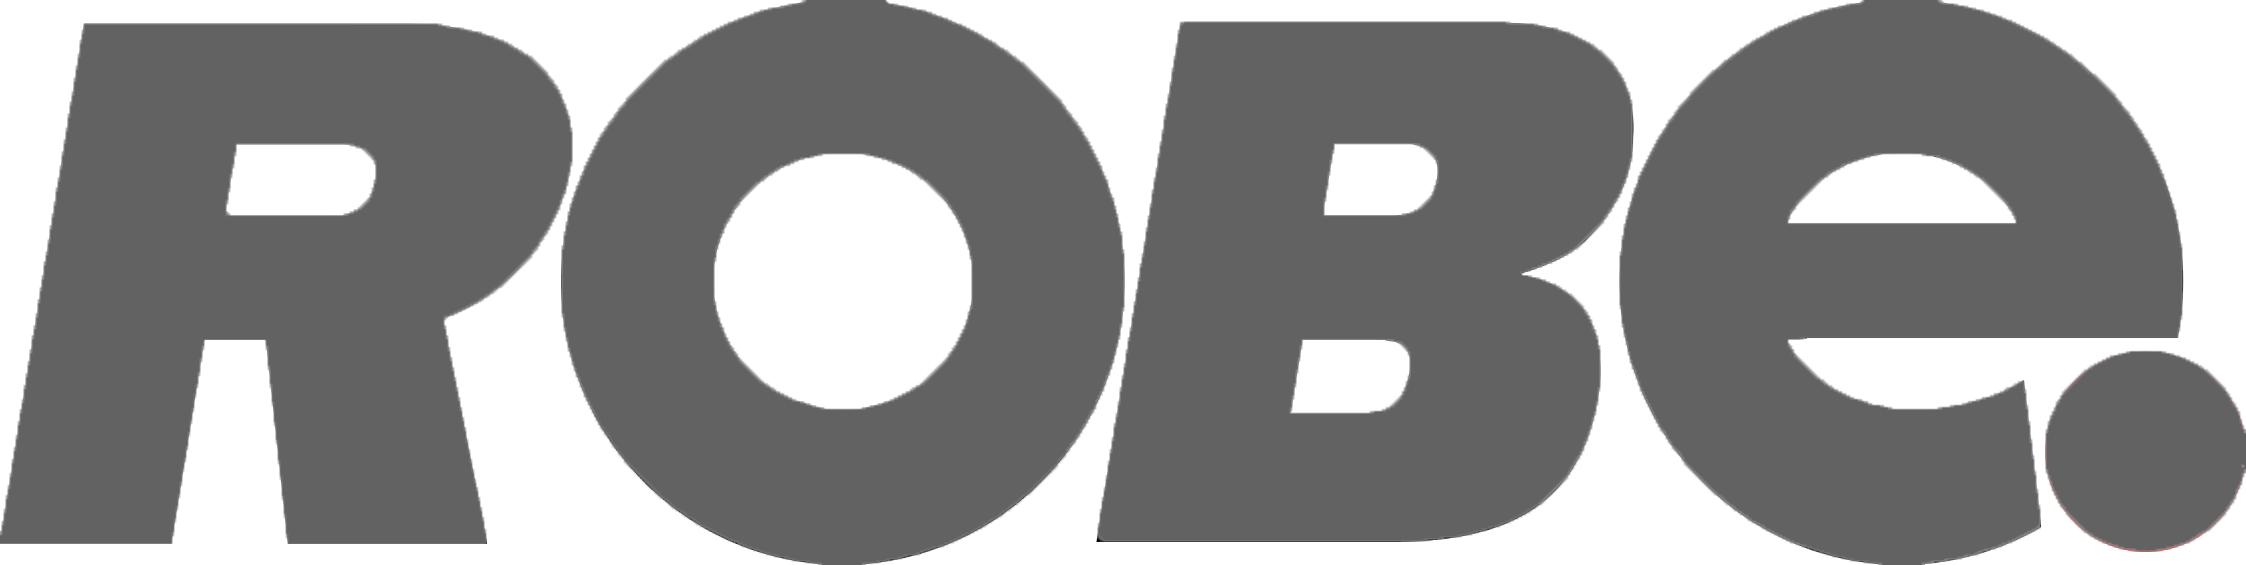 Robe Logo gray.png